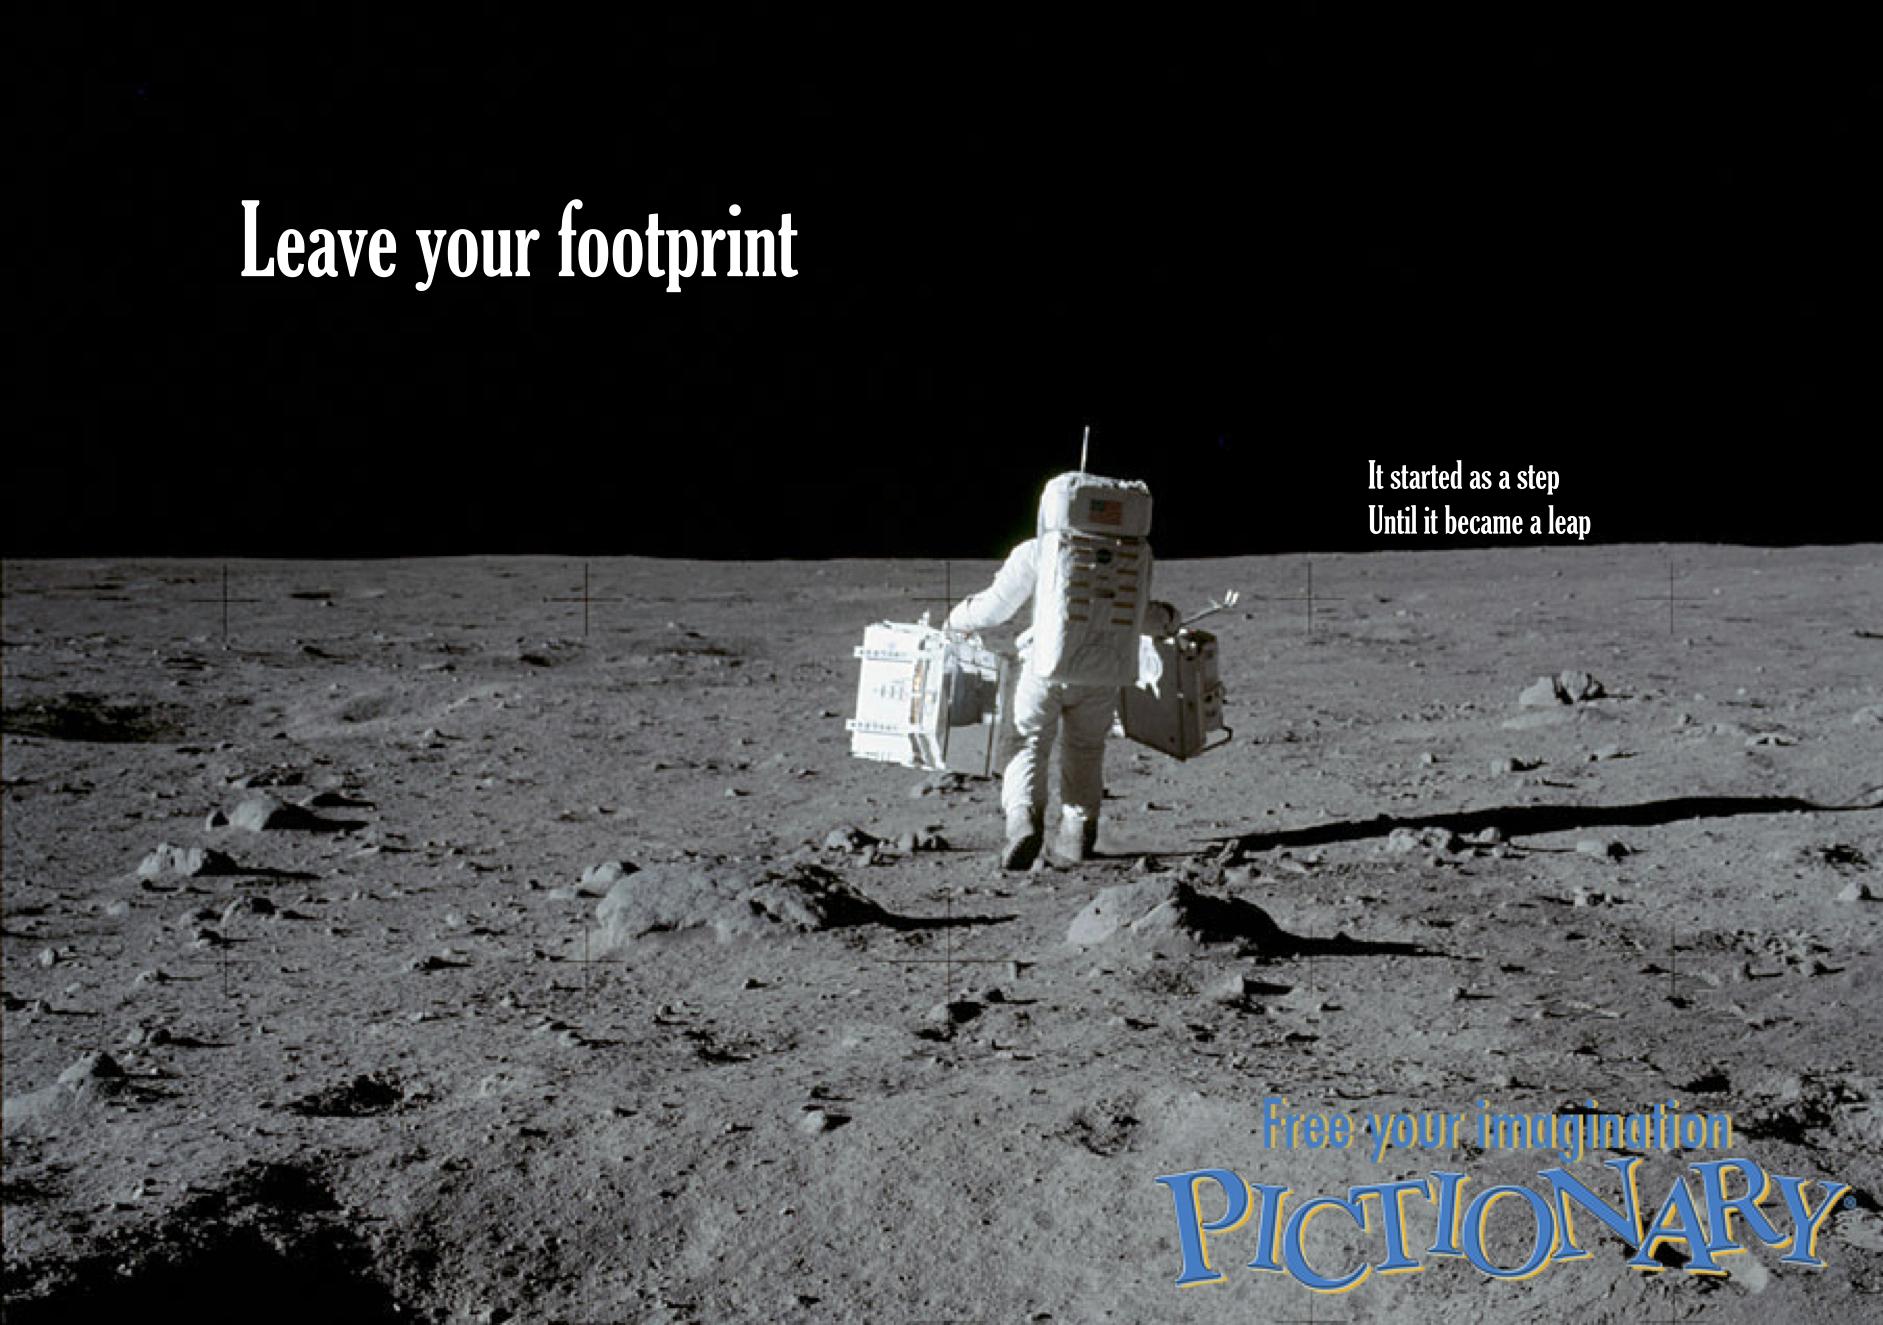 Pictionary Advertisement 1.jpg